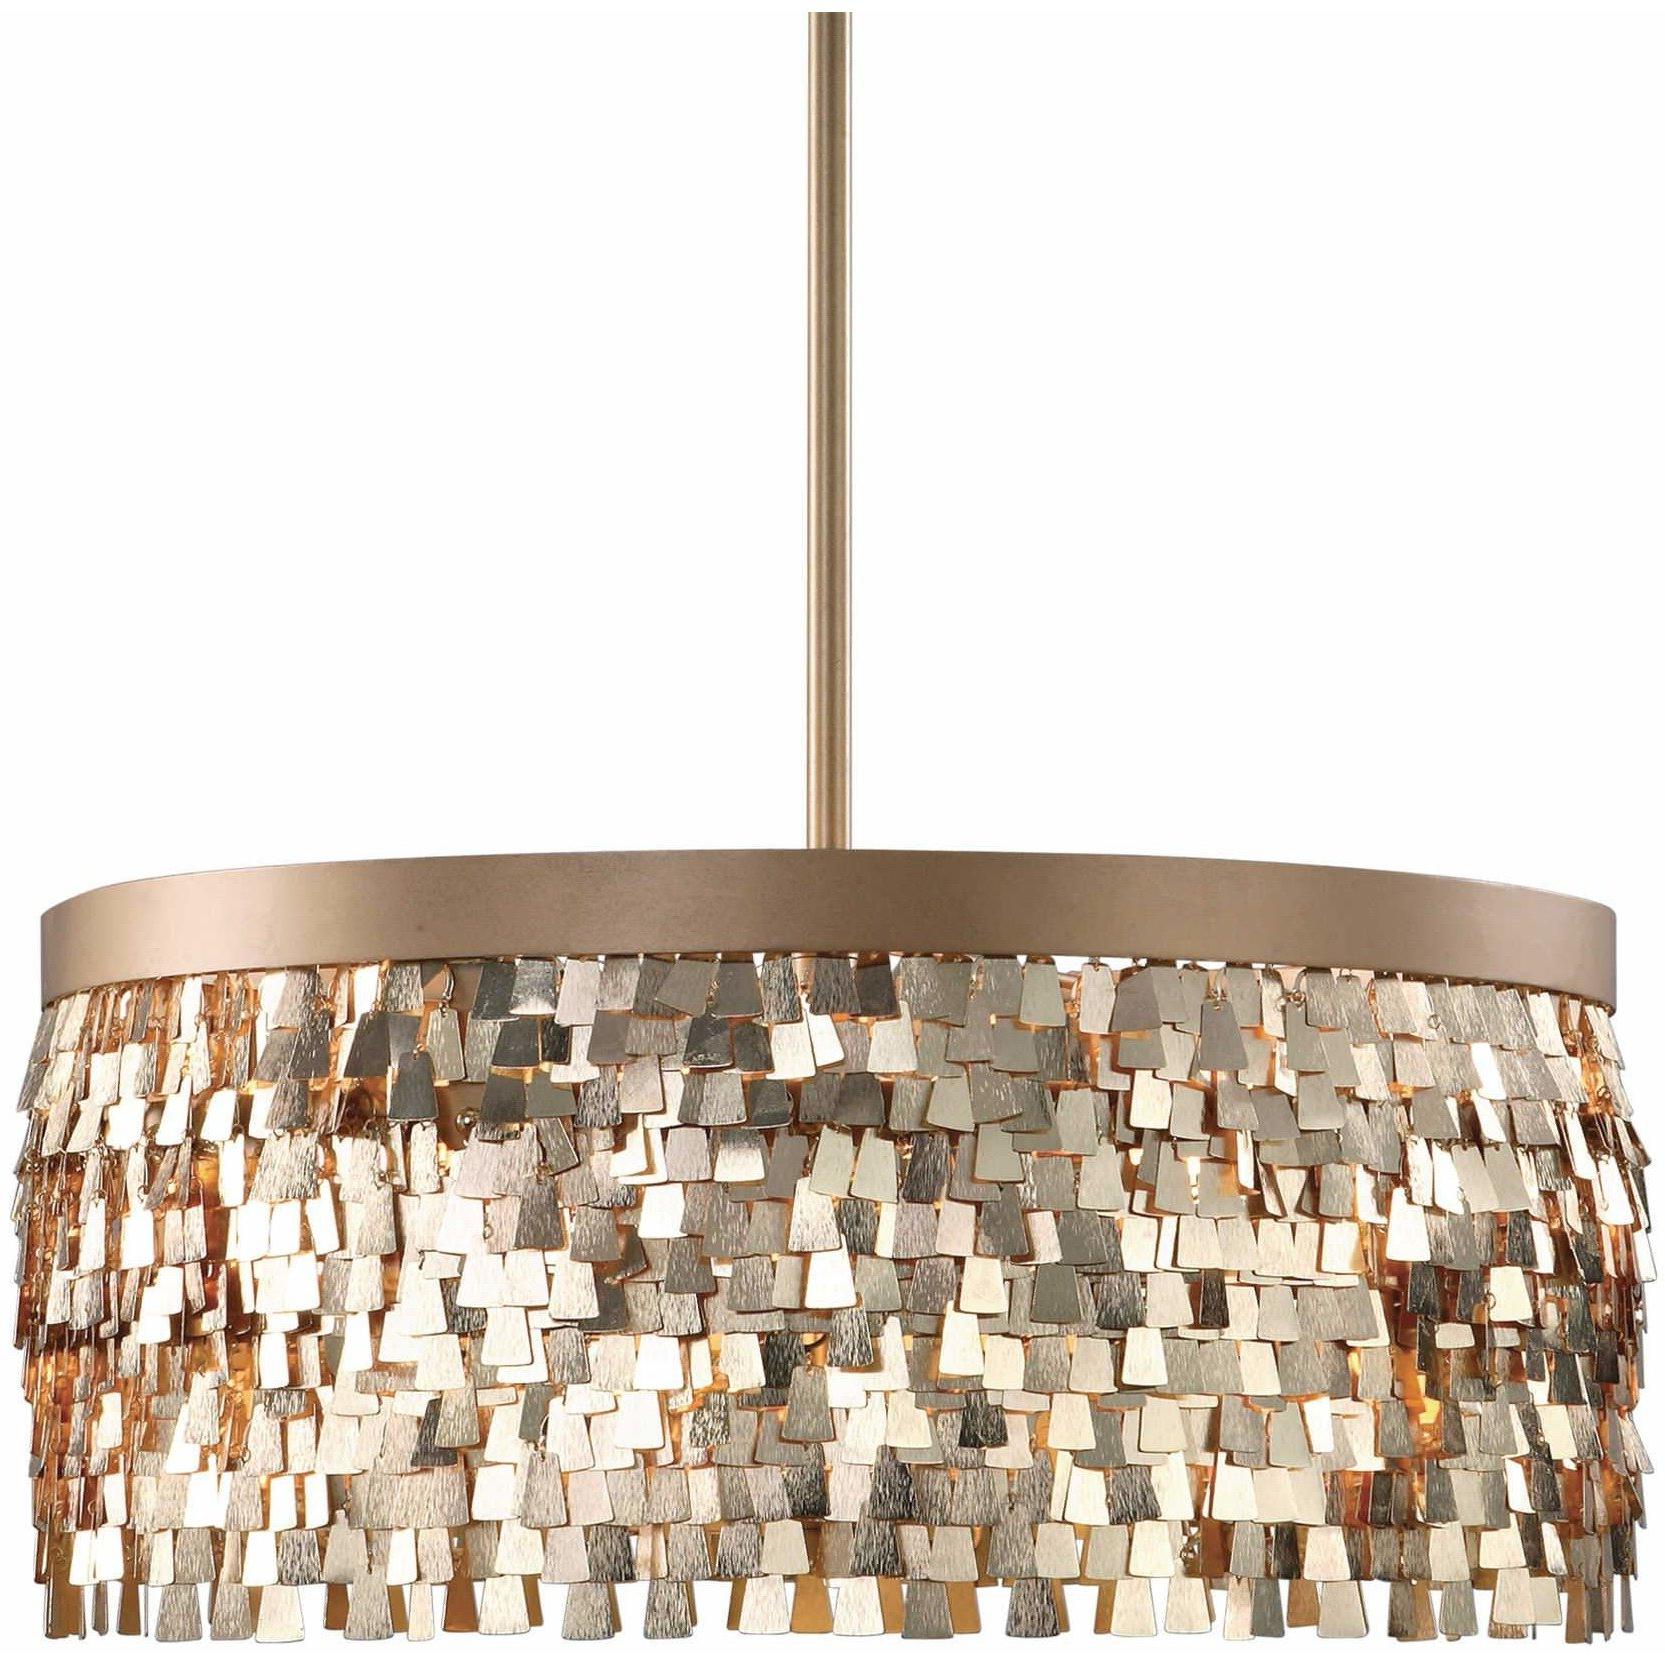 Recent Uttermost 22064 Tillie 3 Light Textured Gold Pendant Light Pertaining To Schutt 4 Light Kitchen Island Pendants (Gallery 18 of 20)